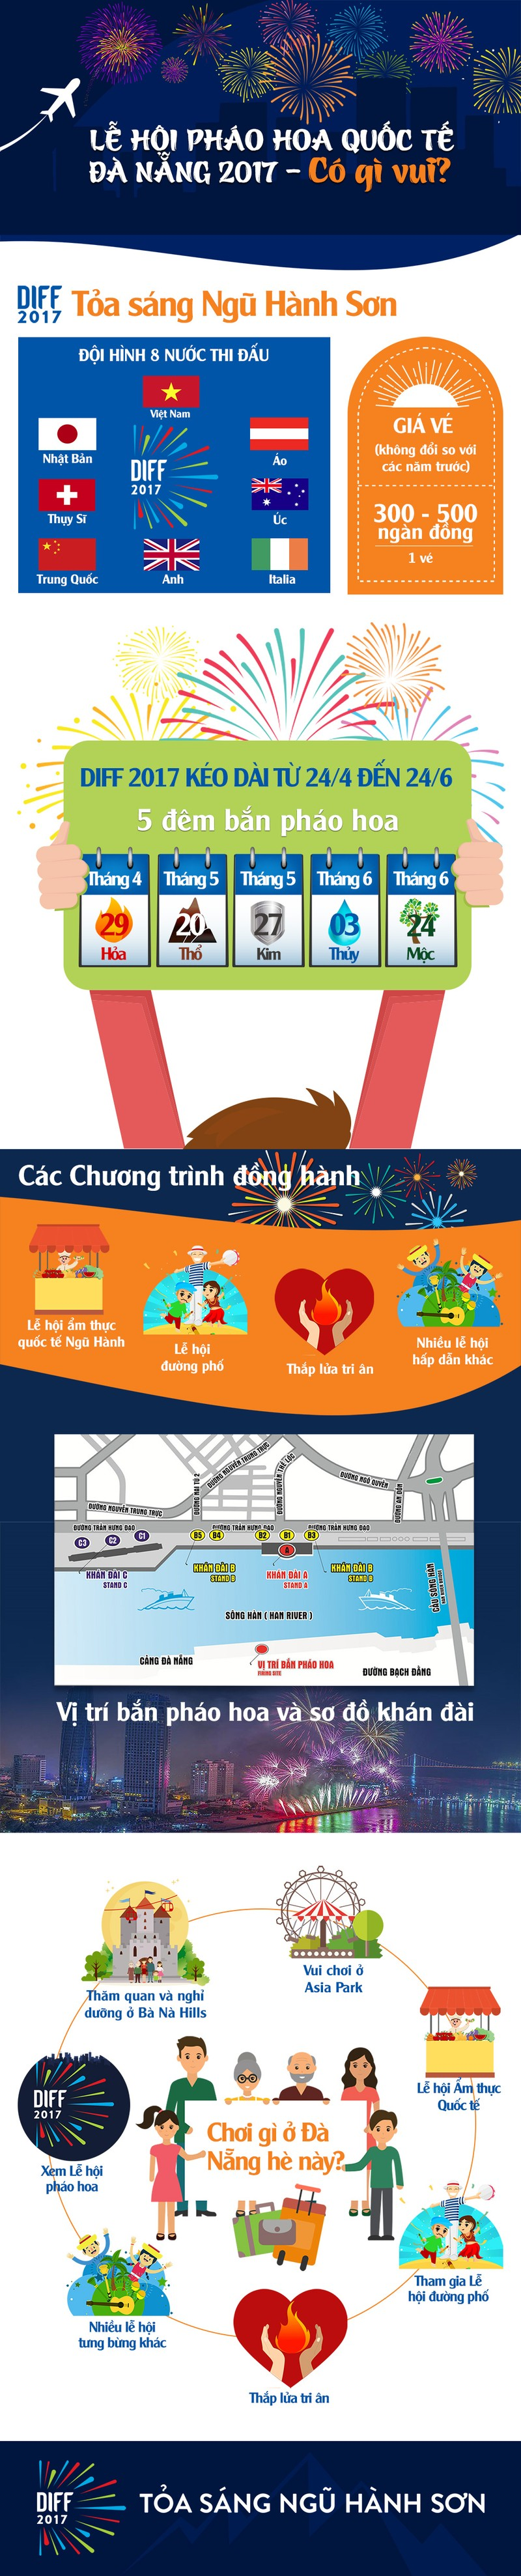 Le hoi phao hoa quoc te Da Nang 2017: Choi the nao cho da?